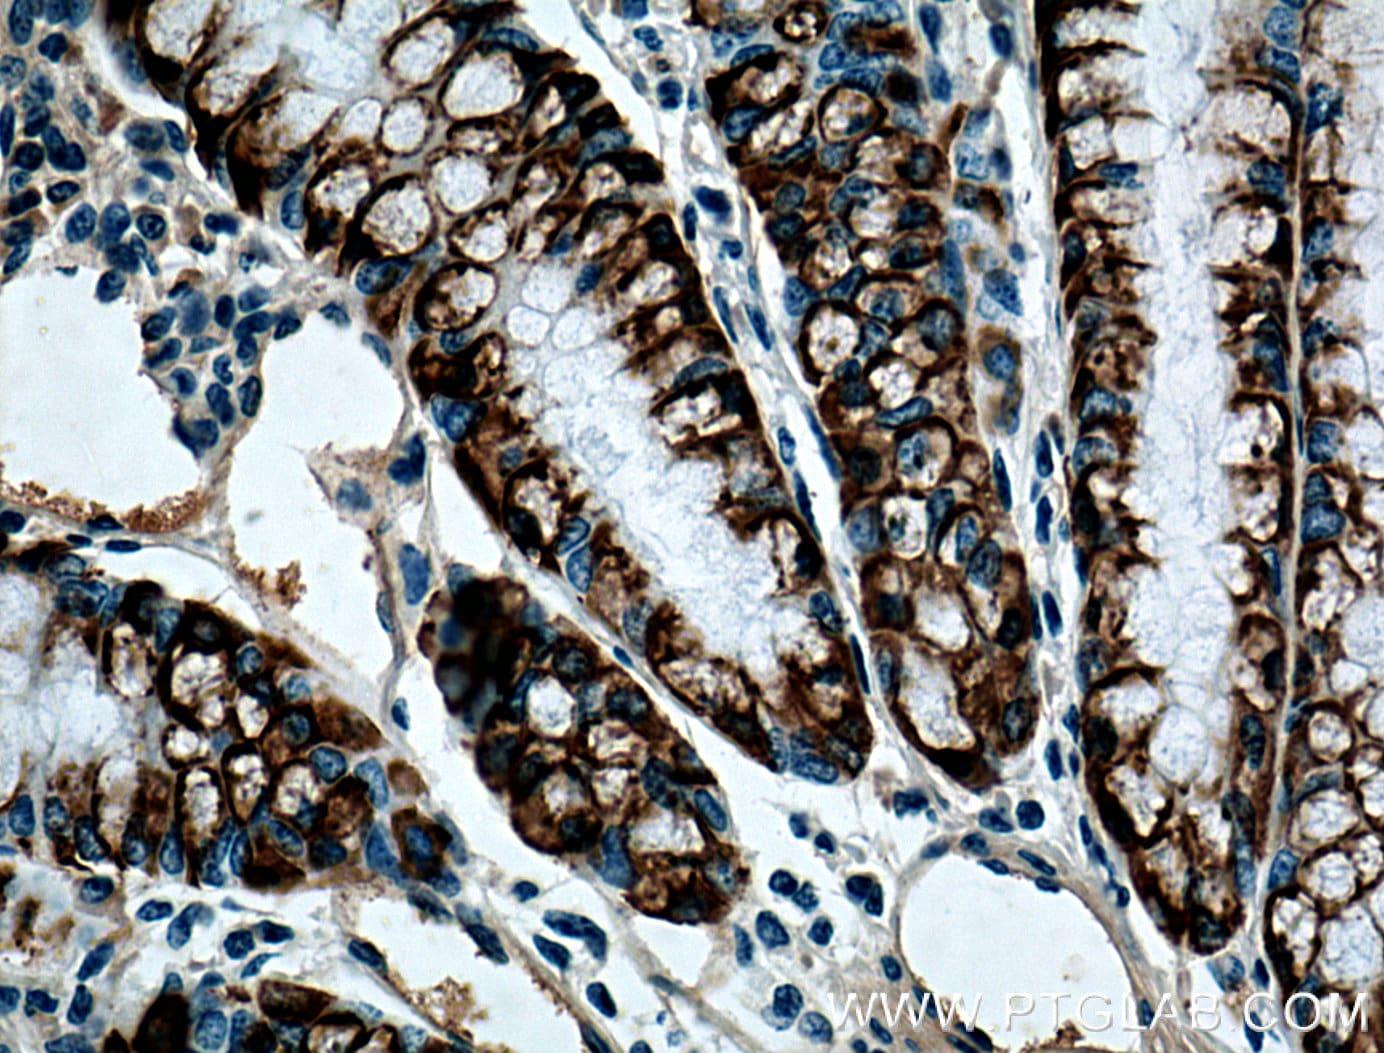 ST6GALNAC6 Antibody in Immunohistochemistry (Paraffin) (IHC (P))